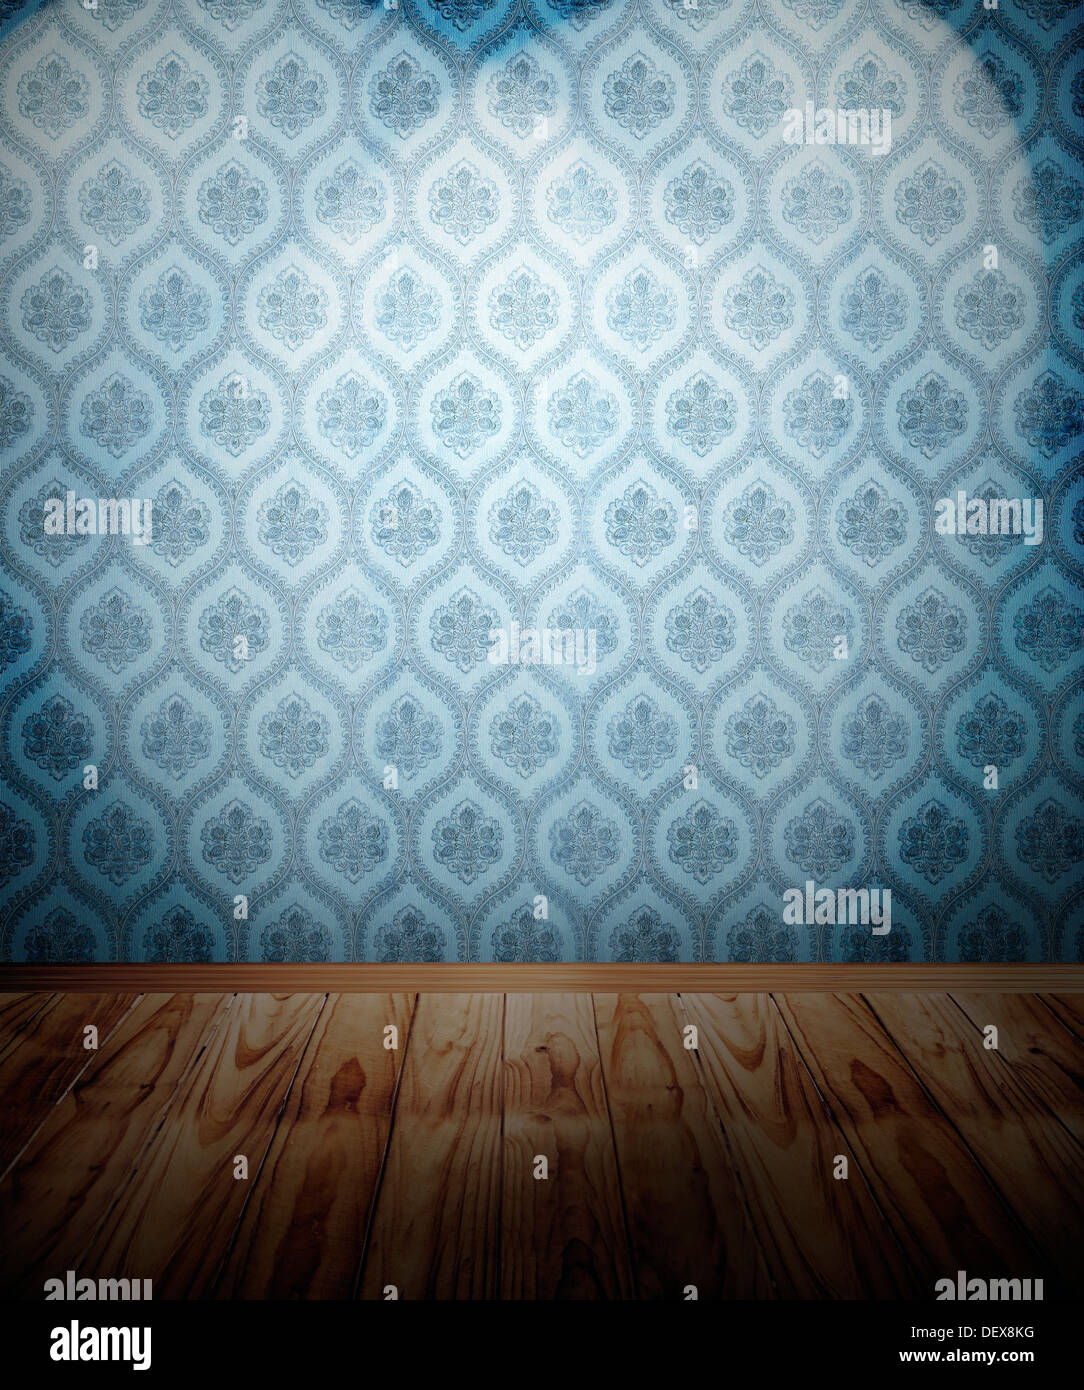 Wooden floor and spotlit wallpaper - Stock Image